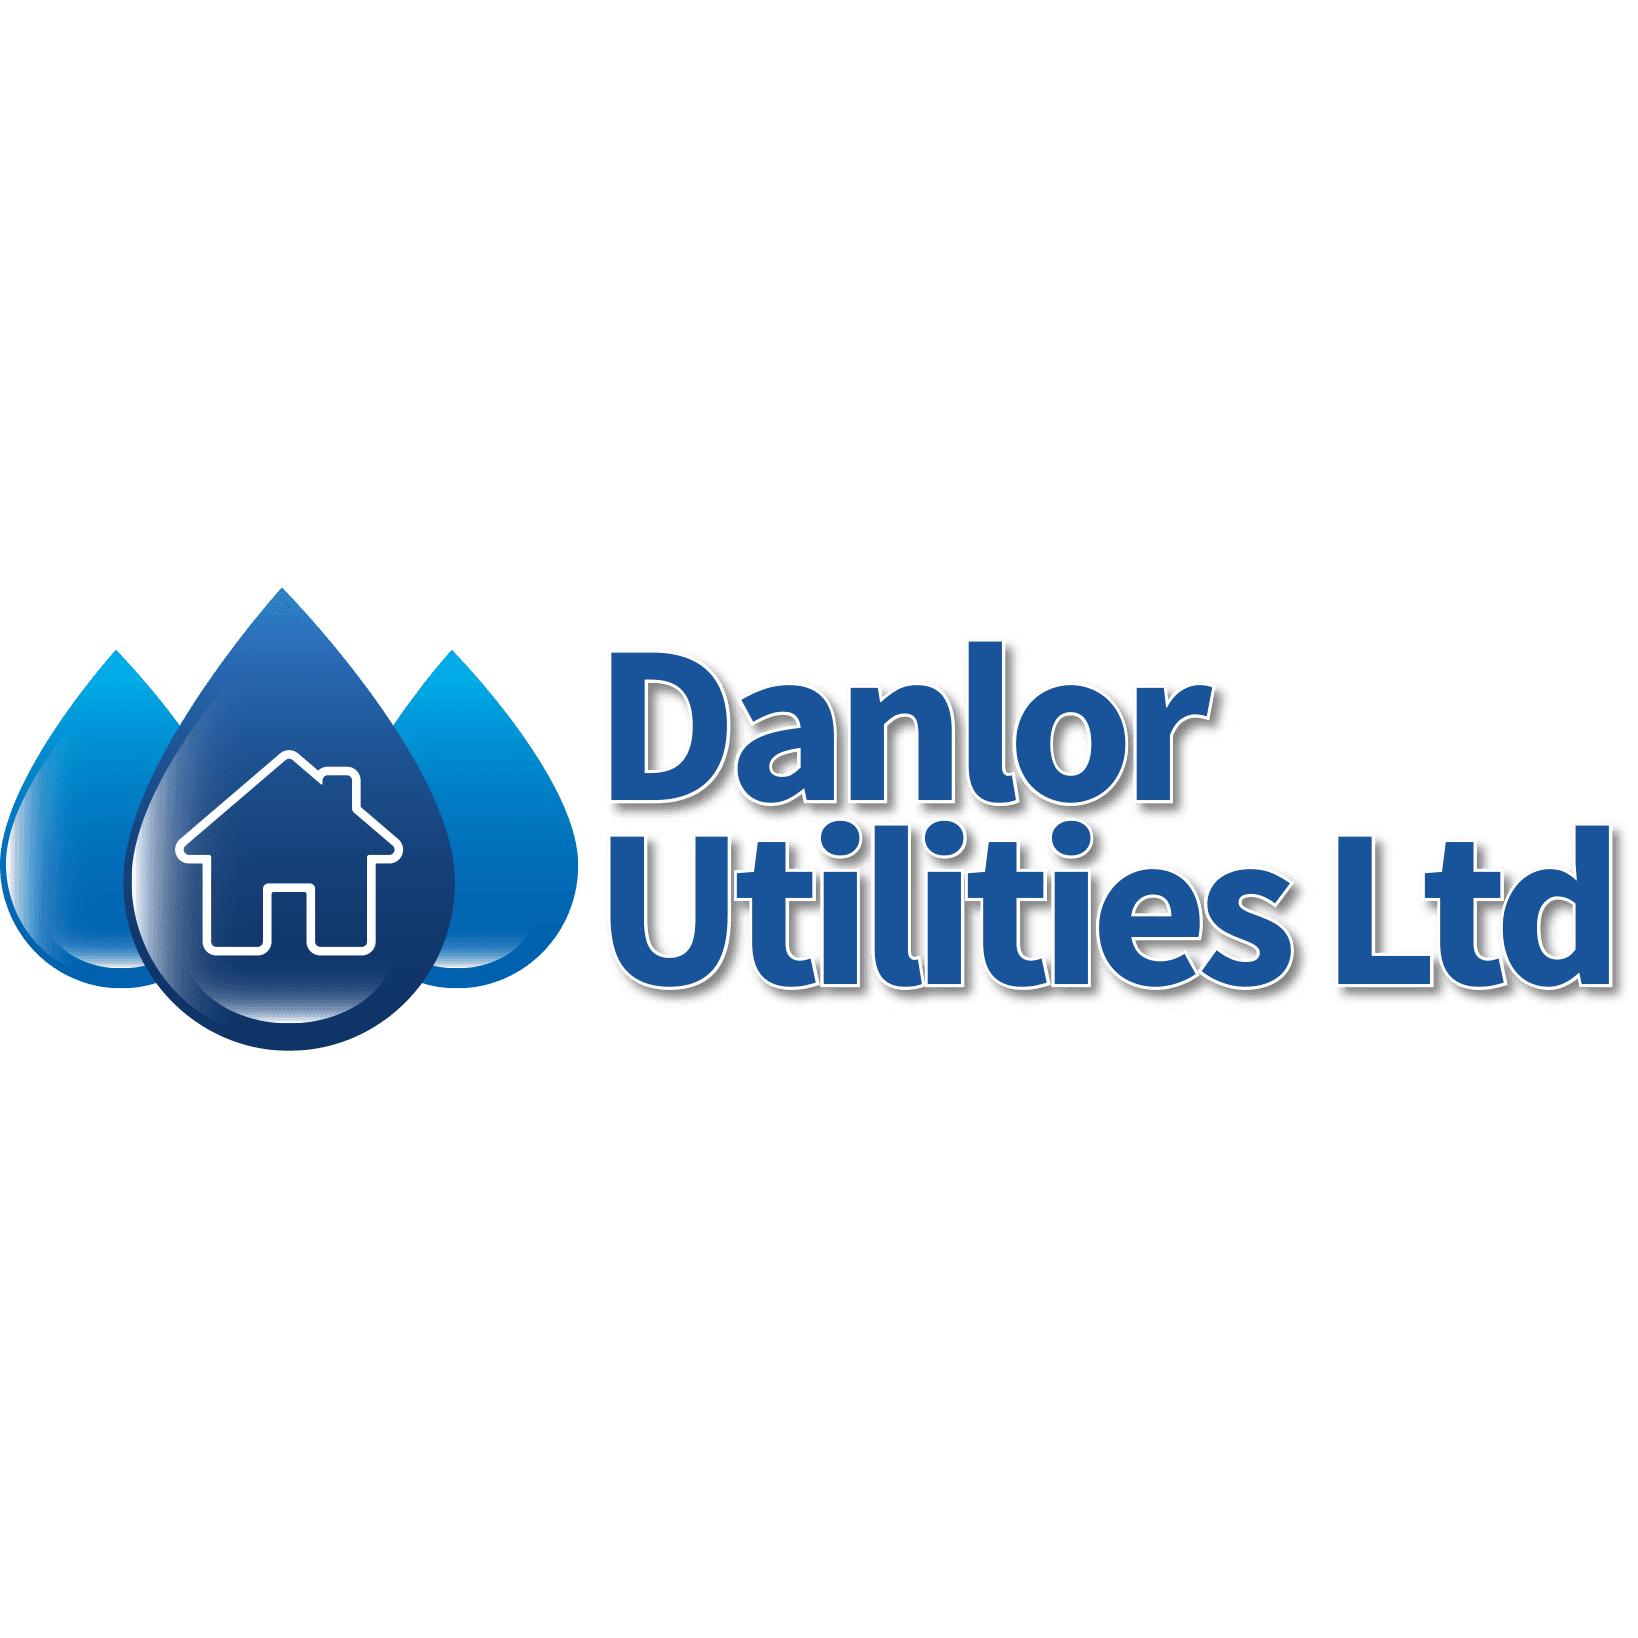 Danlor Utilities Ltd - Belfast, County Antrim BT15 2GG - 02890 279970 | ShowMeLocal.com